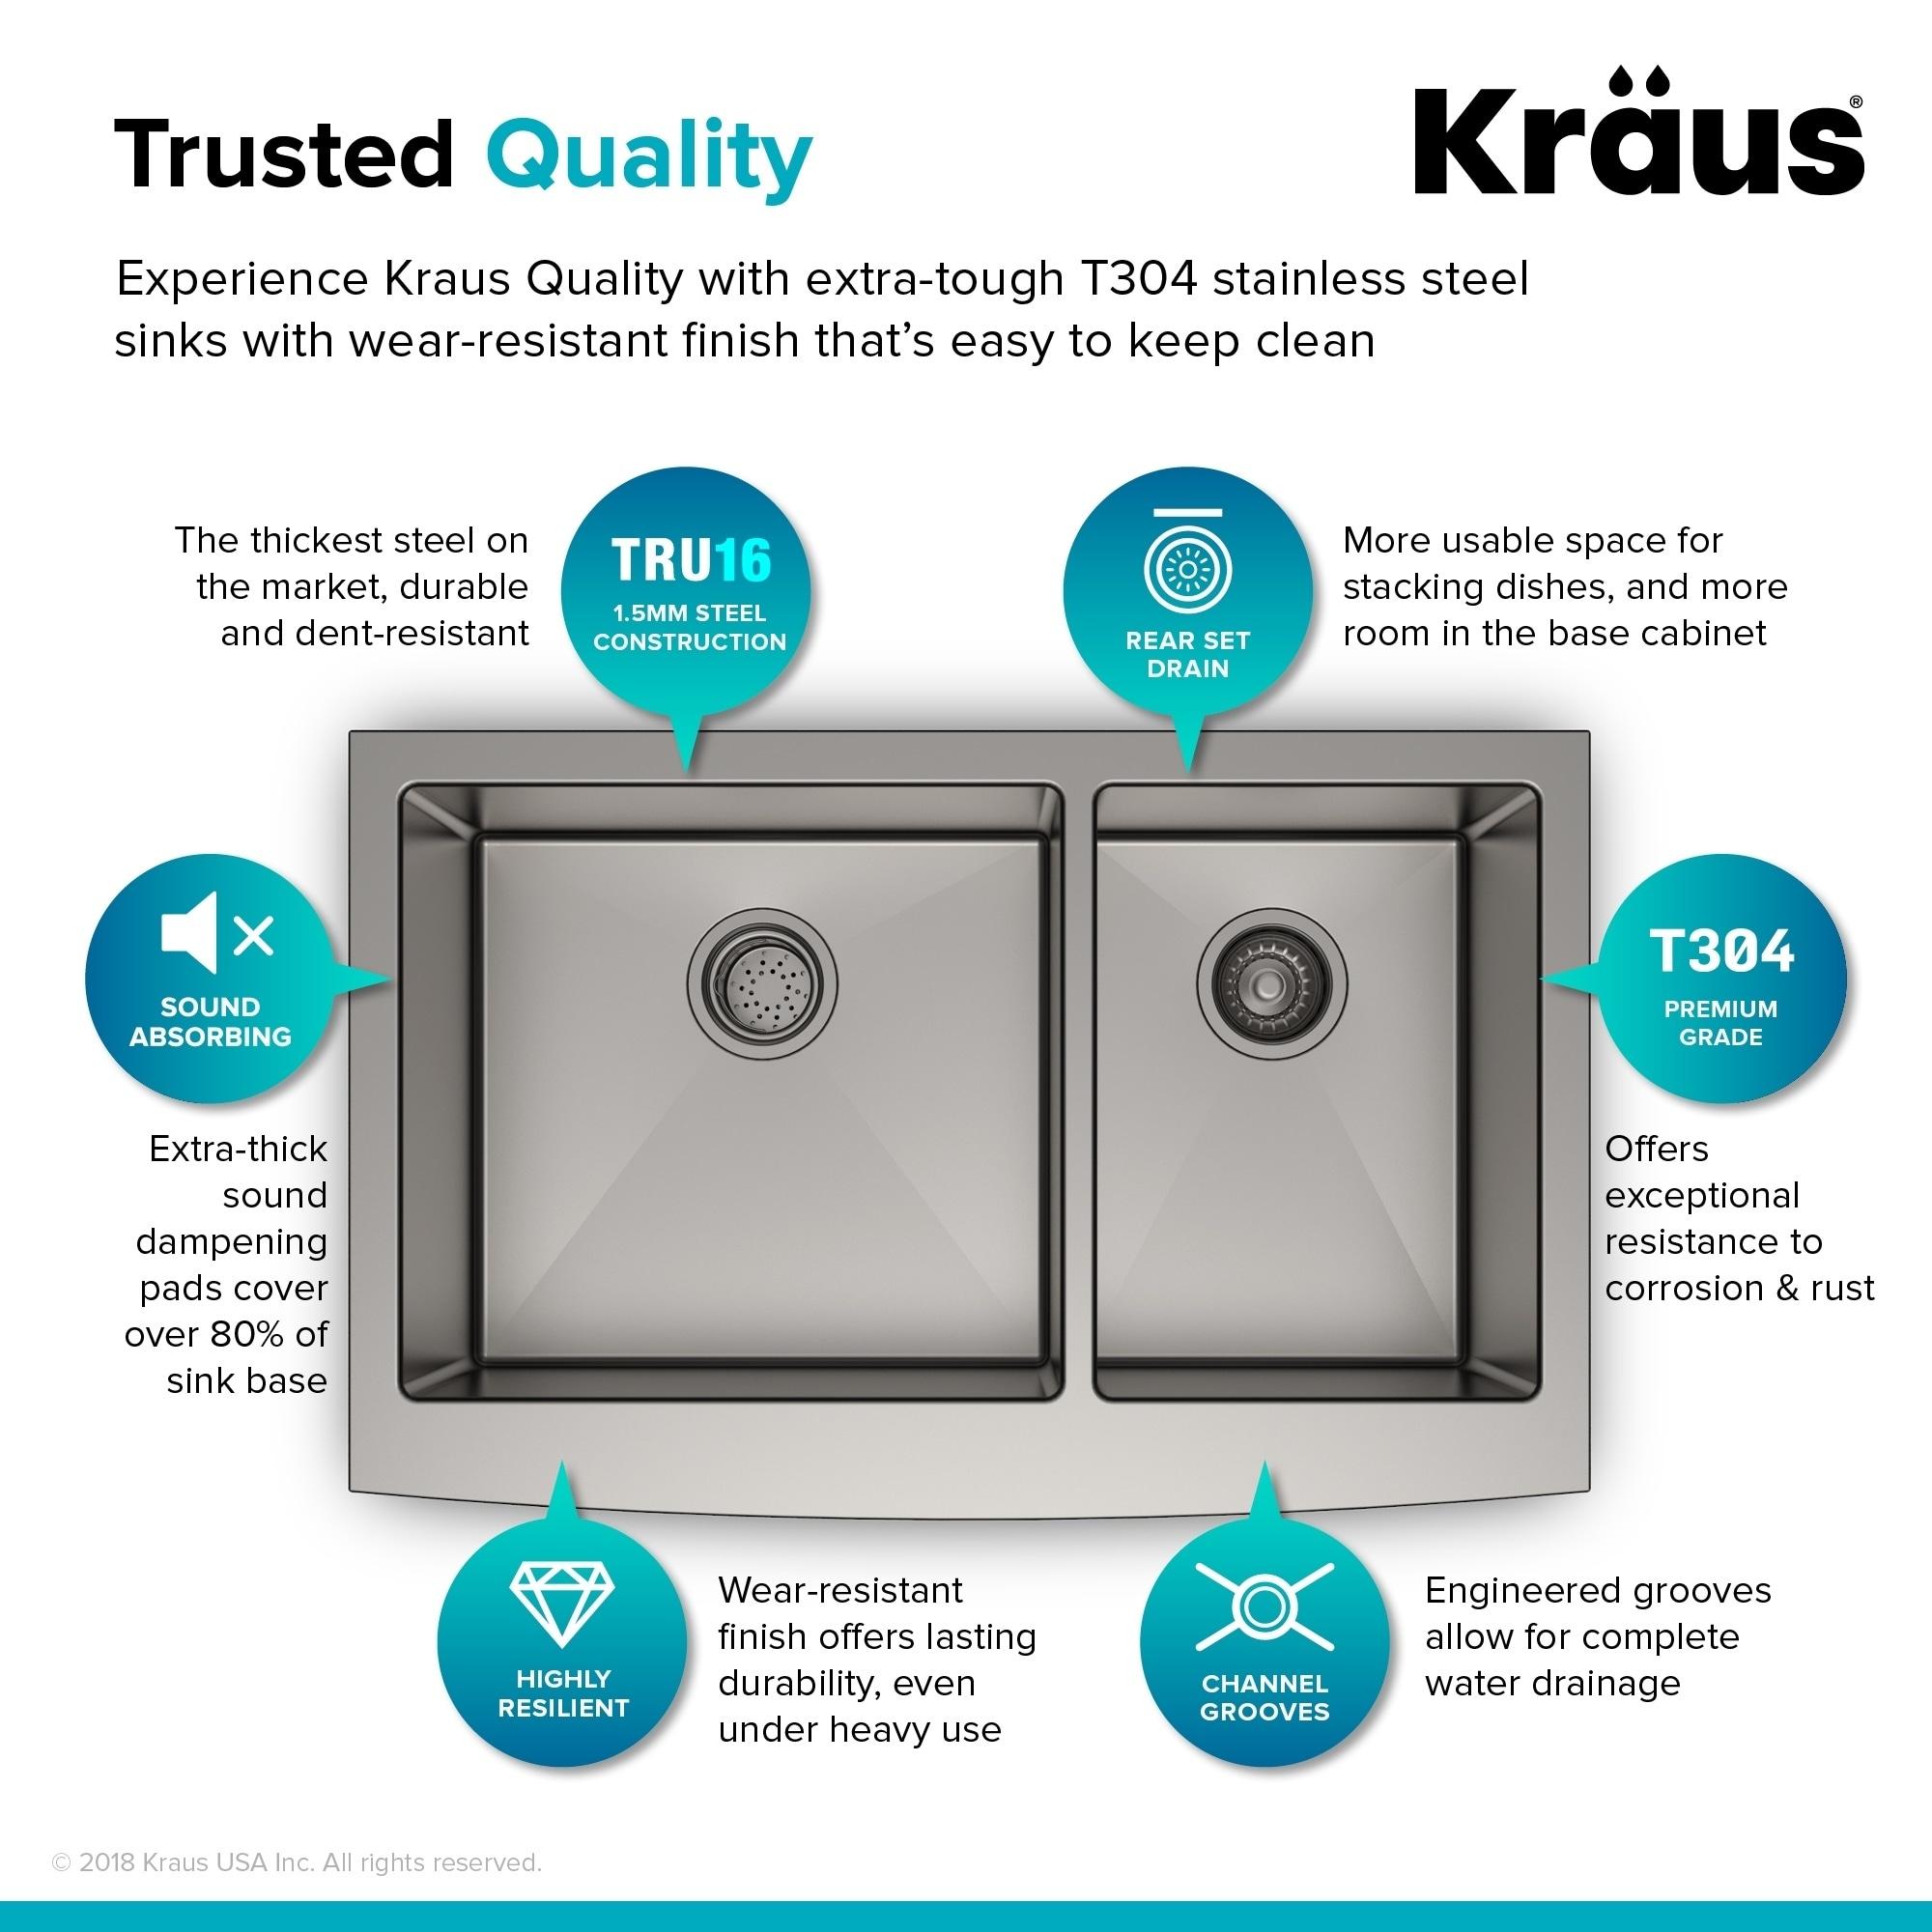 Kraus KHF203-33 Farmhouse 33 inch 2-Bowl Stainless Steel Kitchen Sink